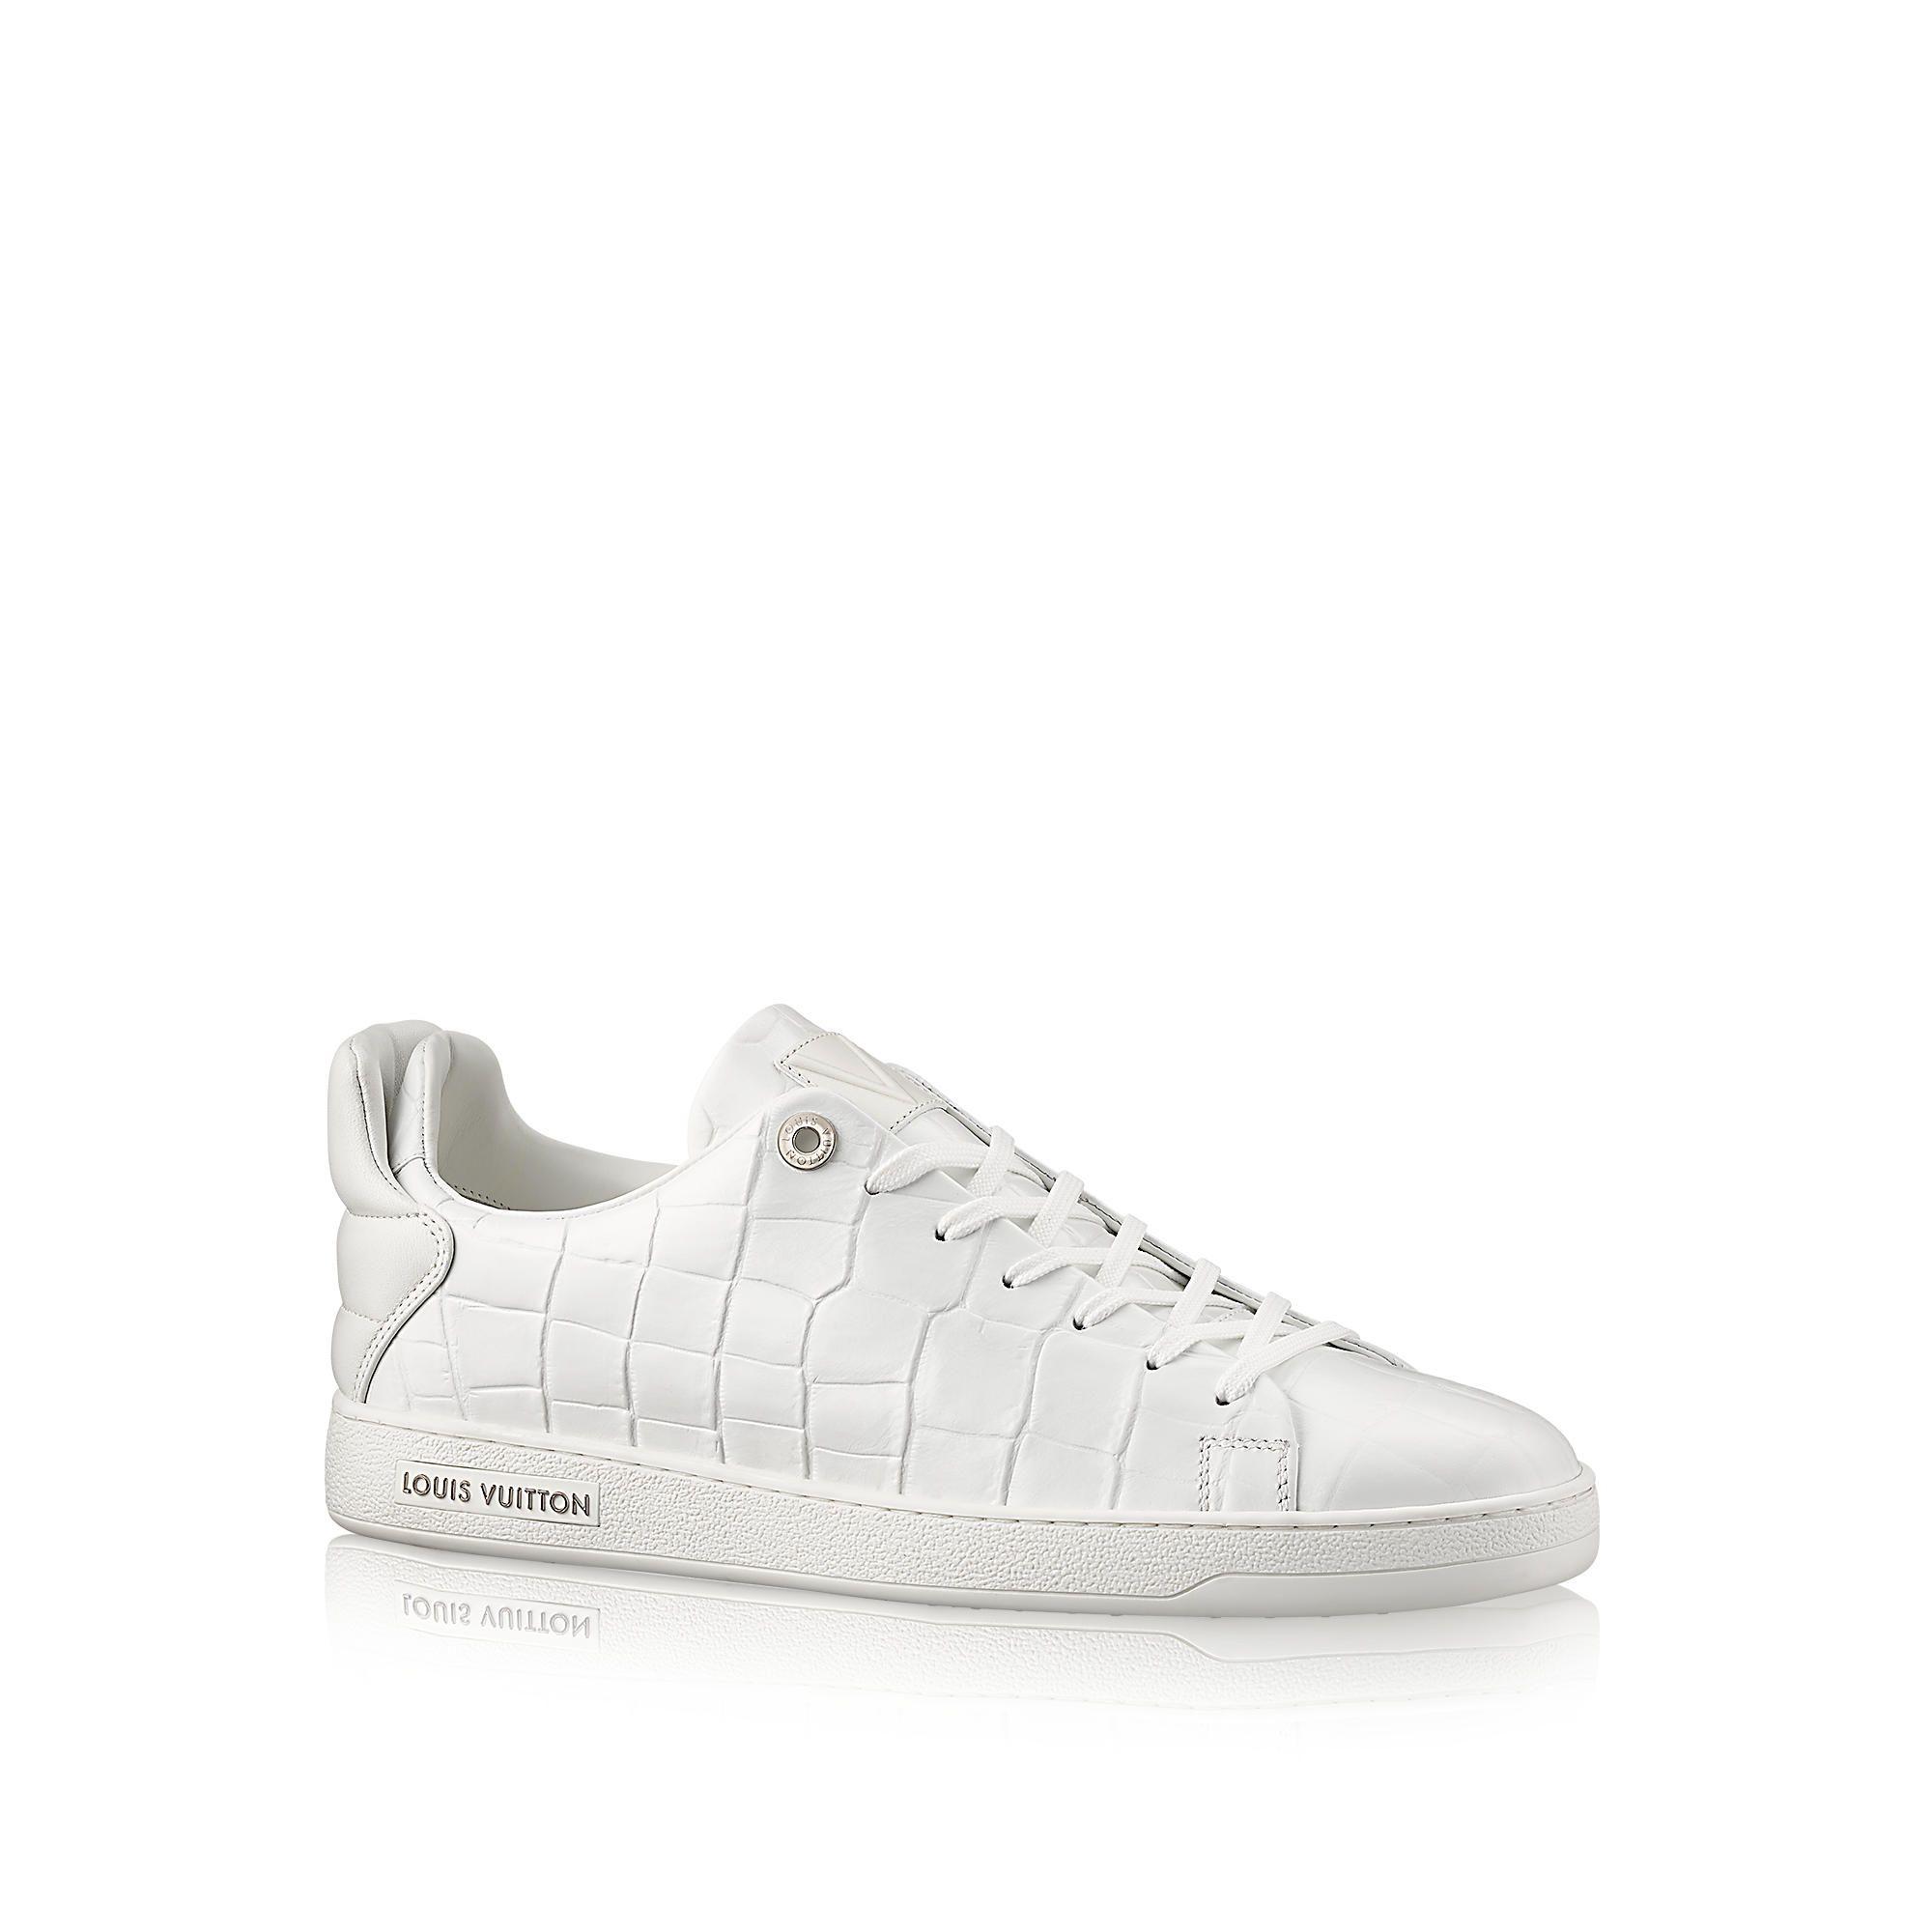 the best attitude 59bdf 30f06 Entdecken Sie Frontrow Sneaker via Louis Vuitton